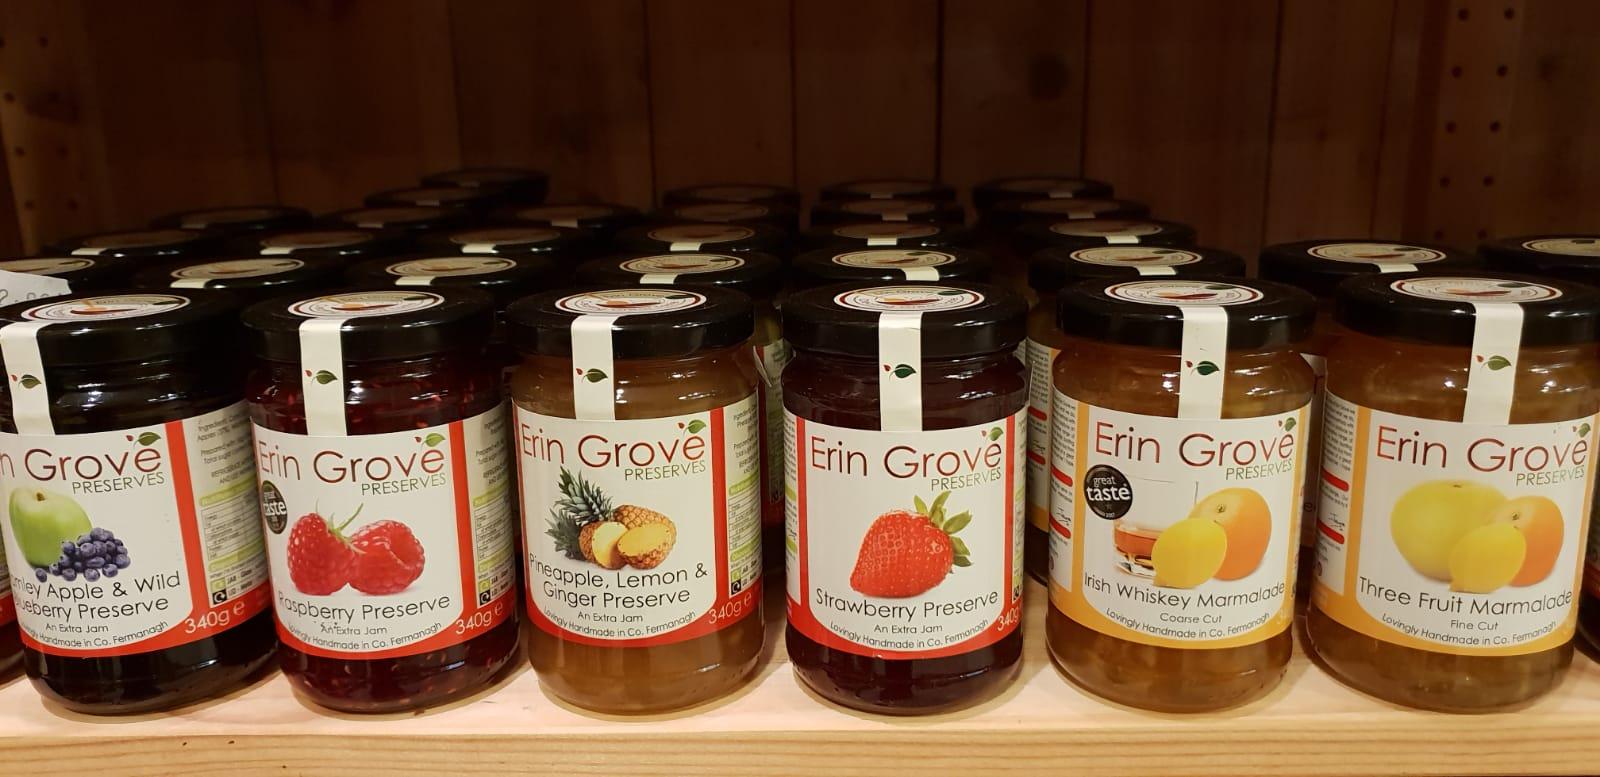 Erin Grove Preserves